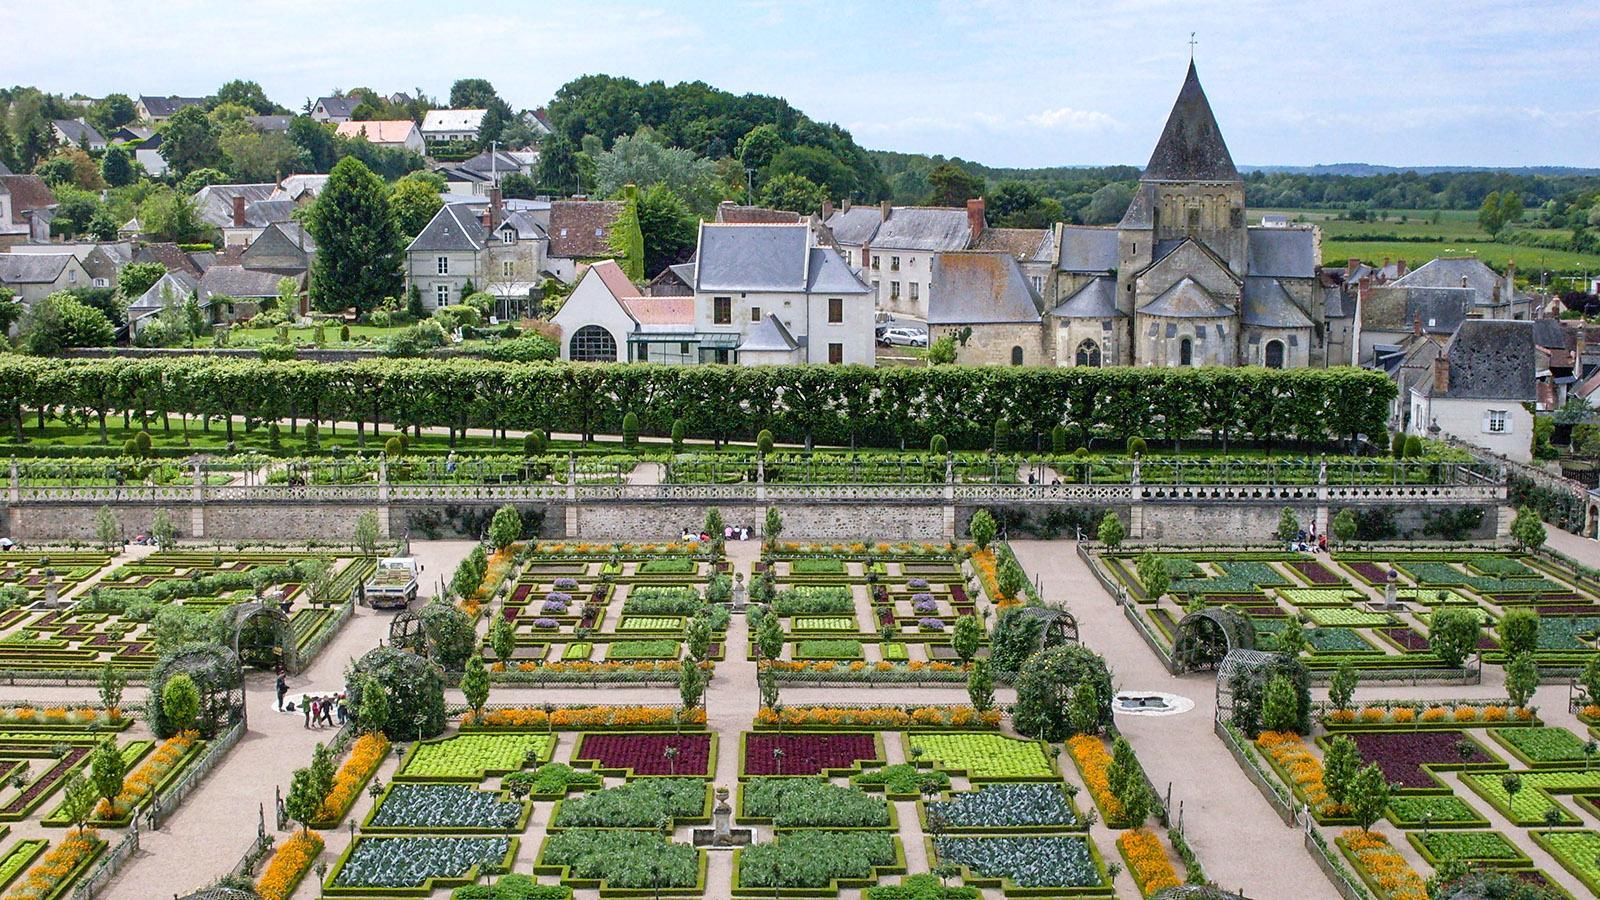 Der Küchengarten des Château de Villandry. Foto: Hilke Maunder